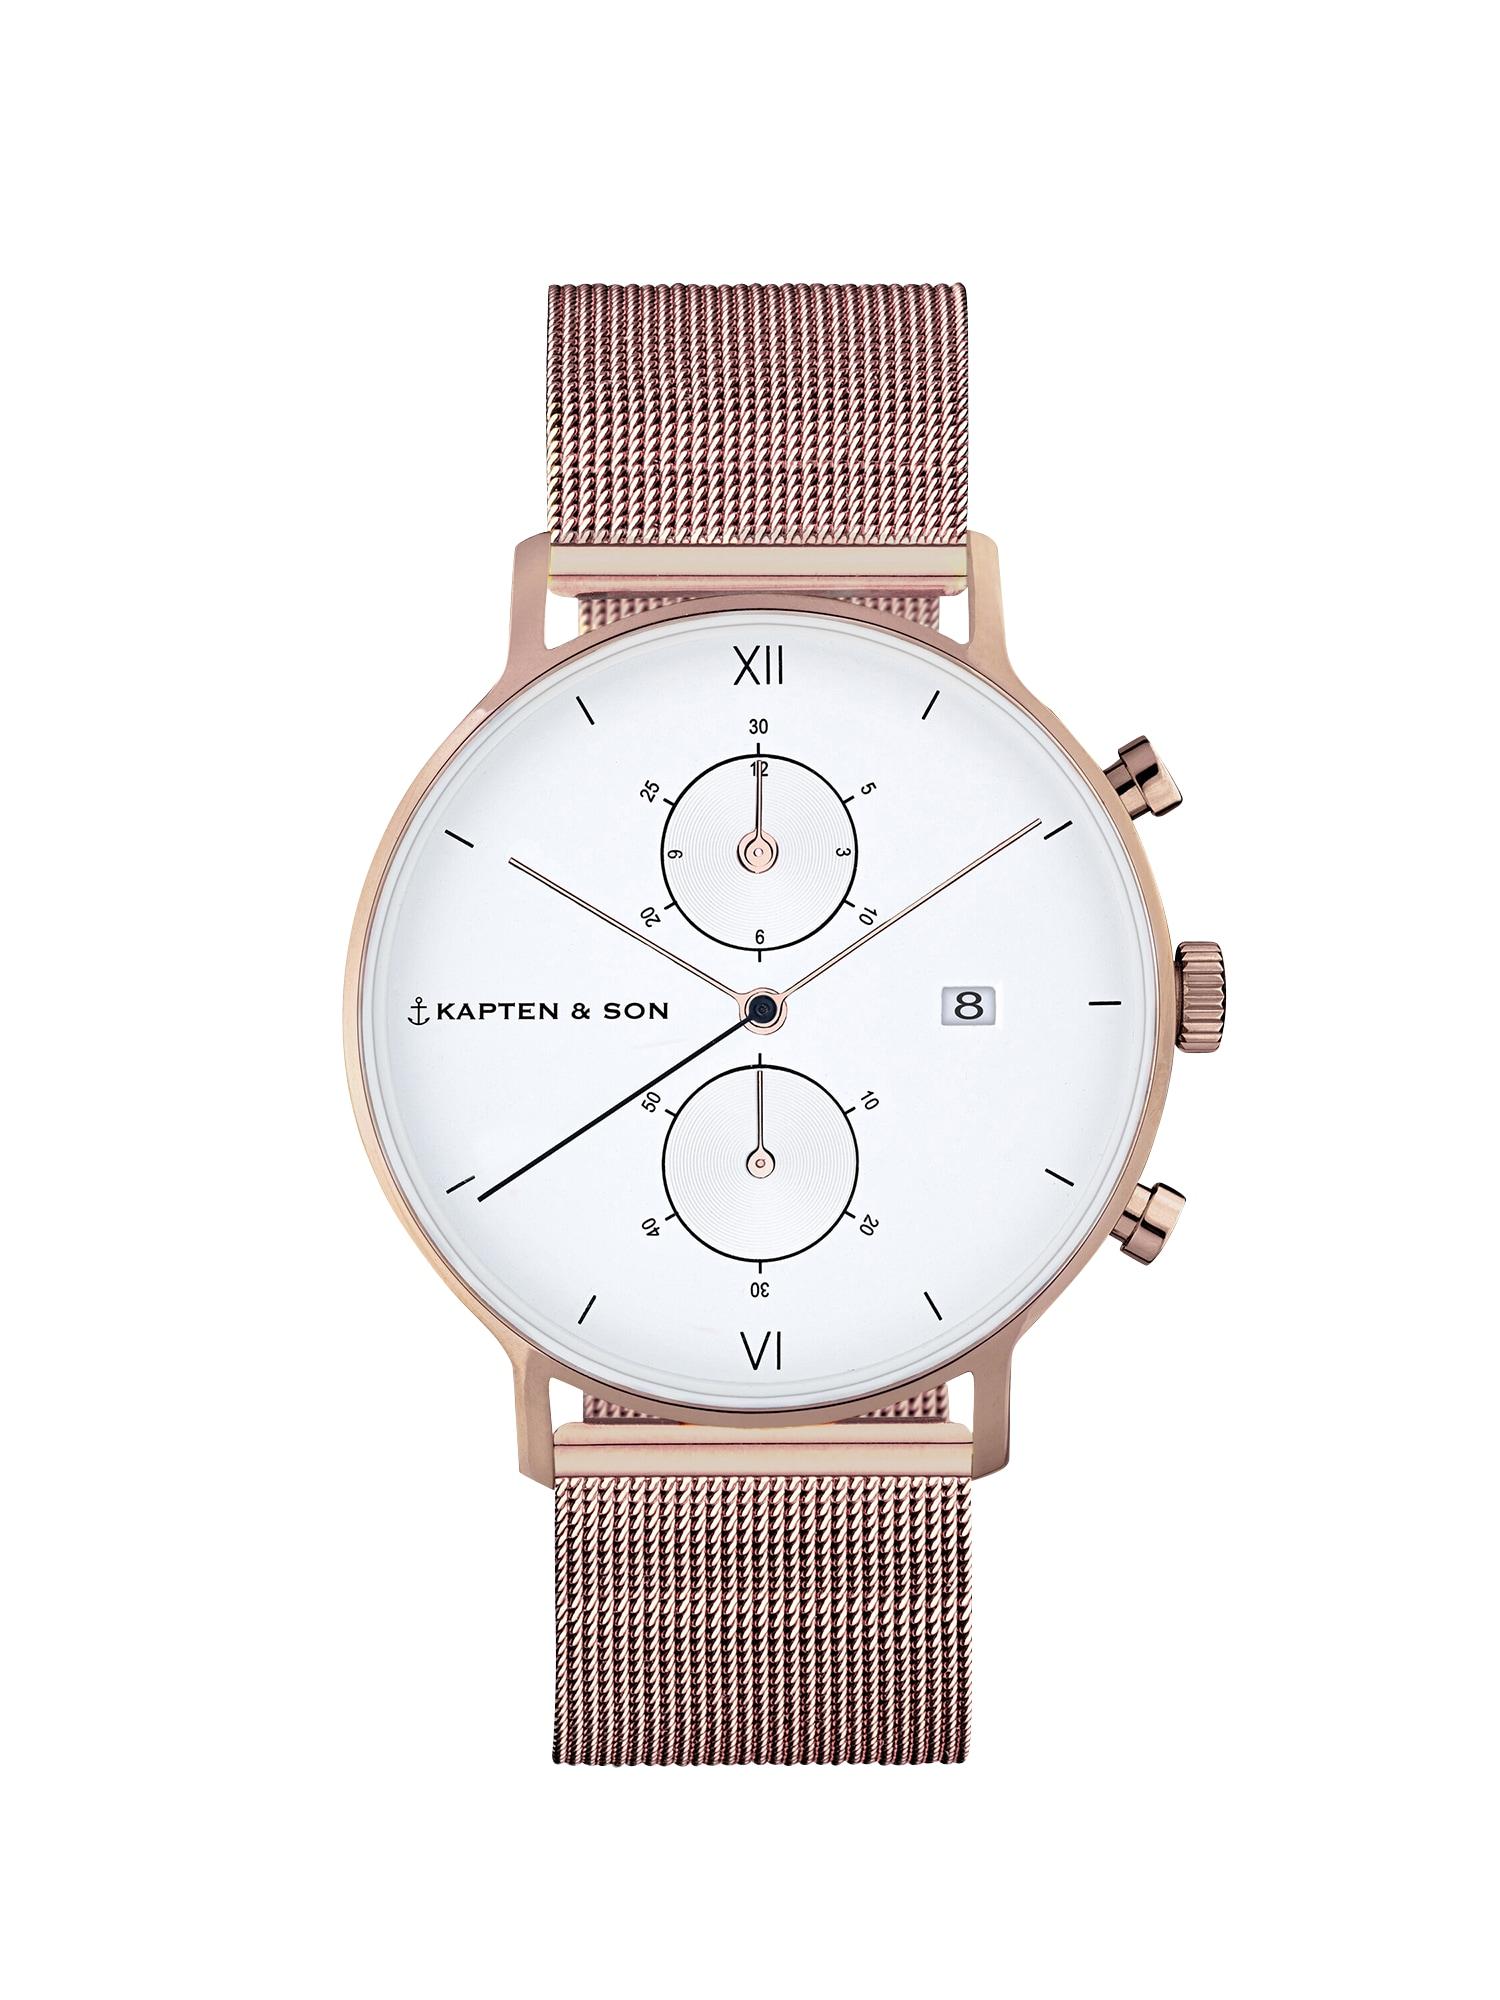 Kapten & Son Analoginis (įprasto dizaino) laikrodis